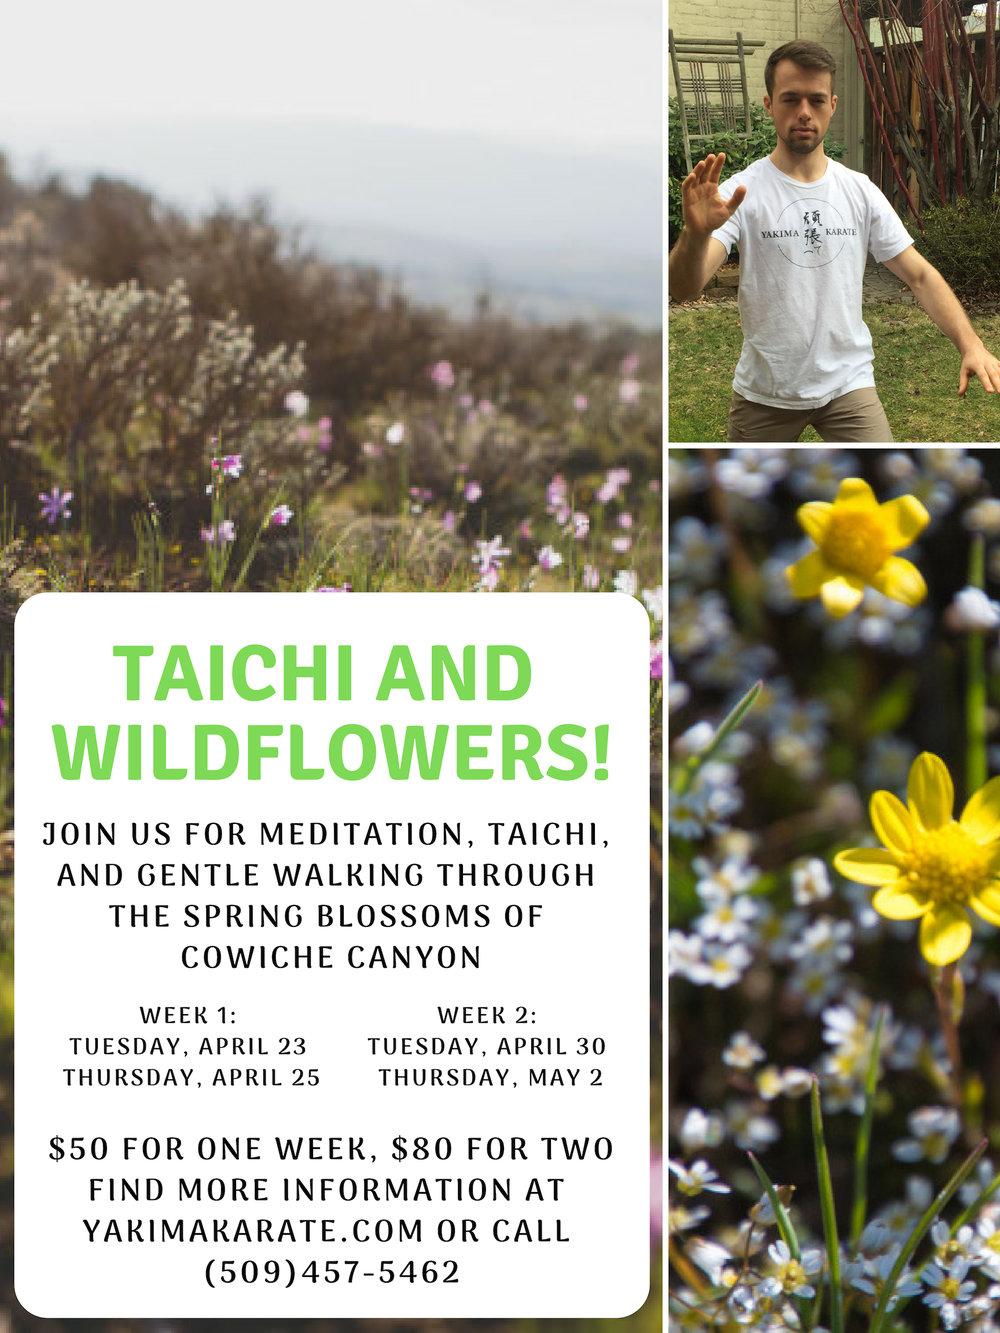 Taichi and Wildflowers.jpg